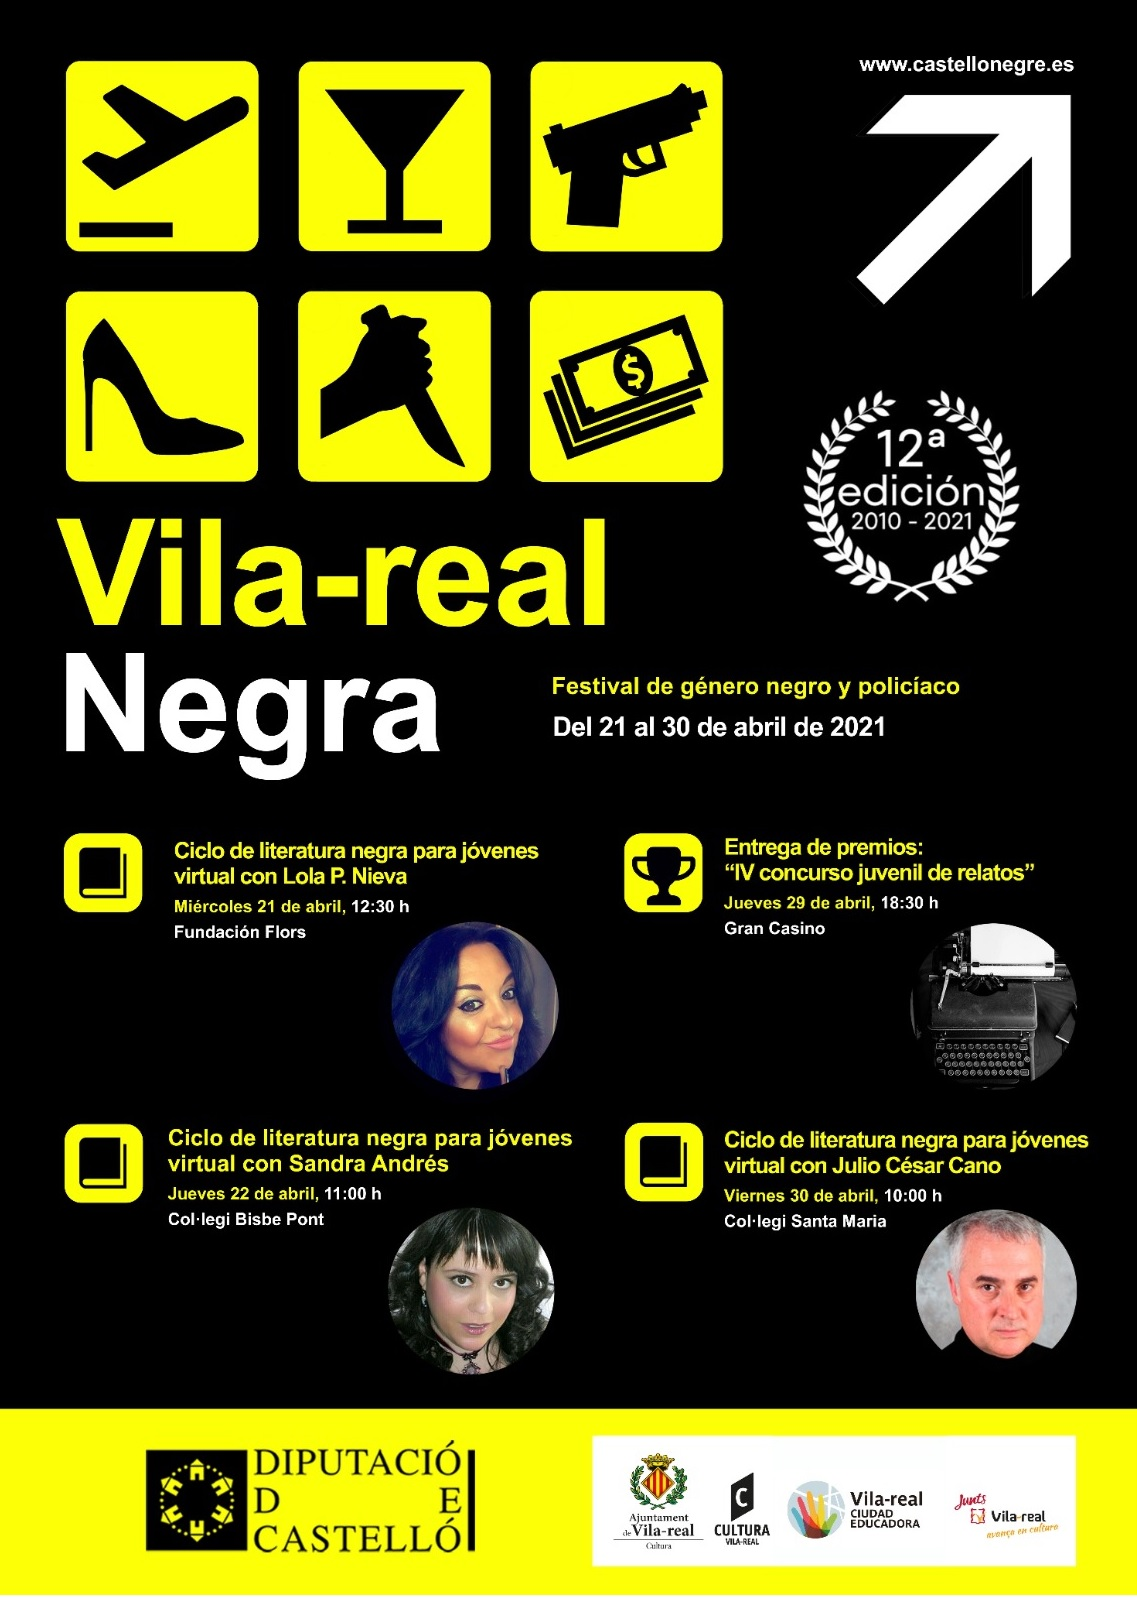 Entrevista a la gestora del festival 'Vila-real Negra', Inma Pitarch